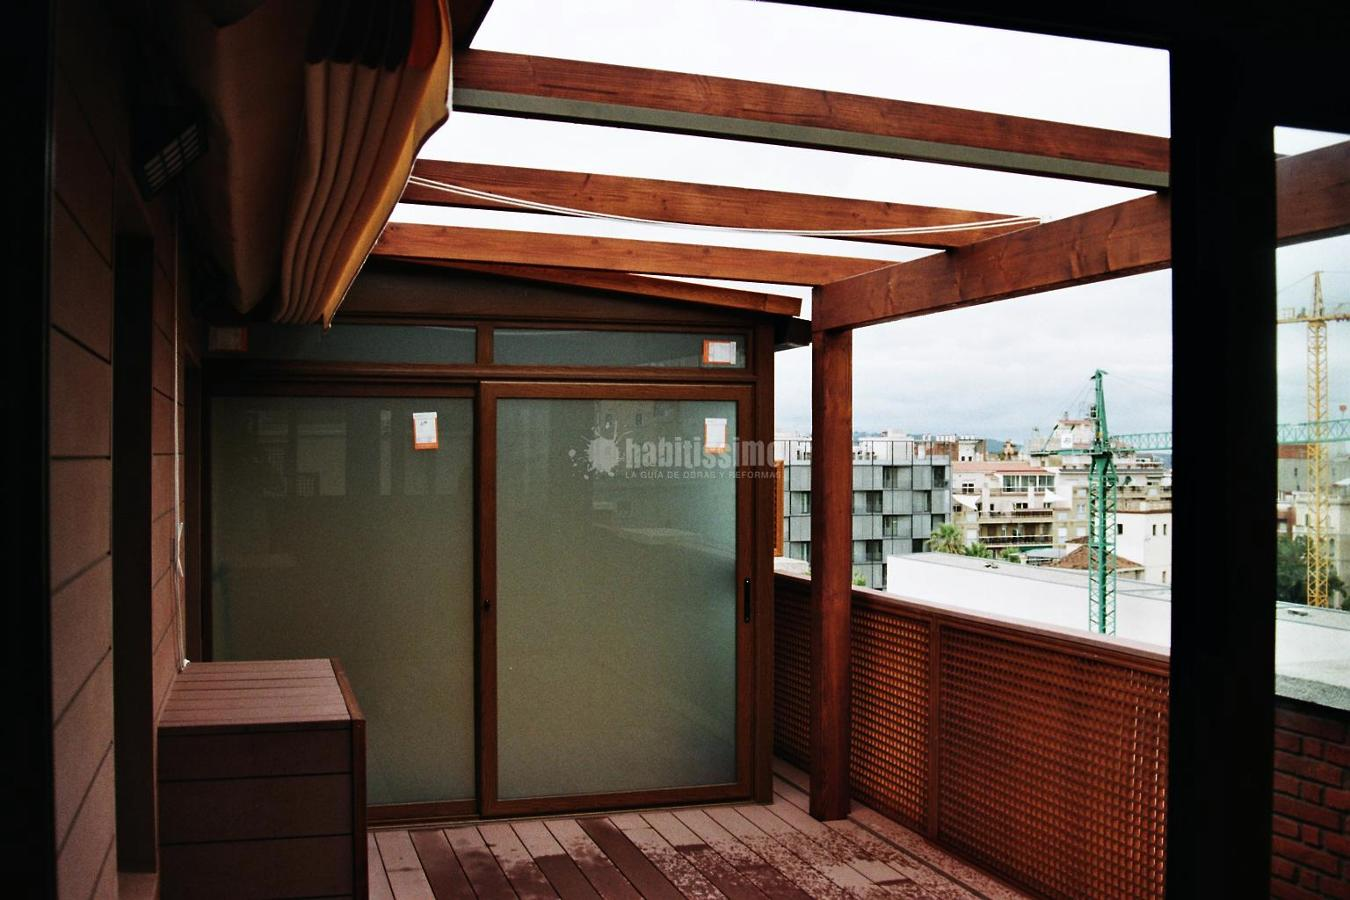 Cerramiento de terraza con madera tecnol gica sin - Cerramientos para terrazas ...